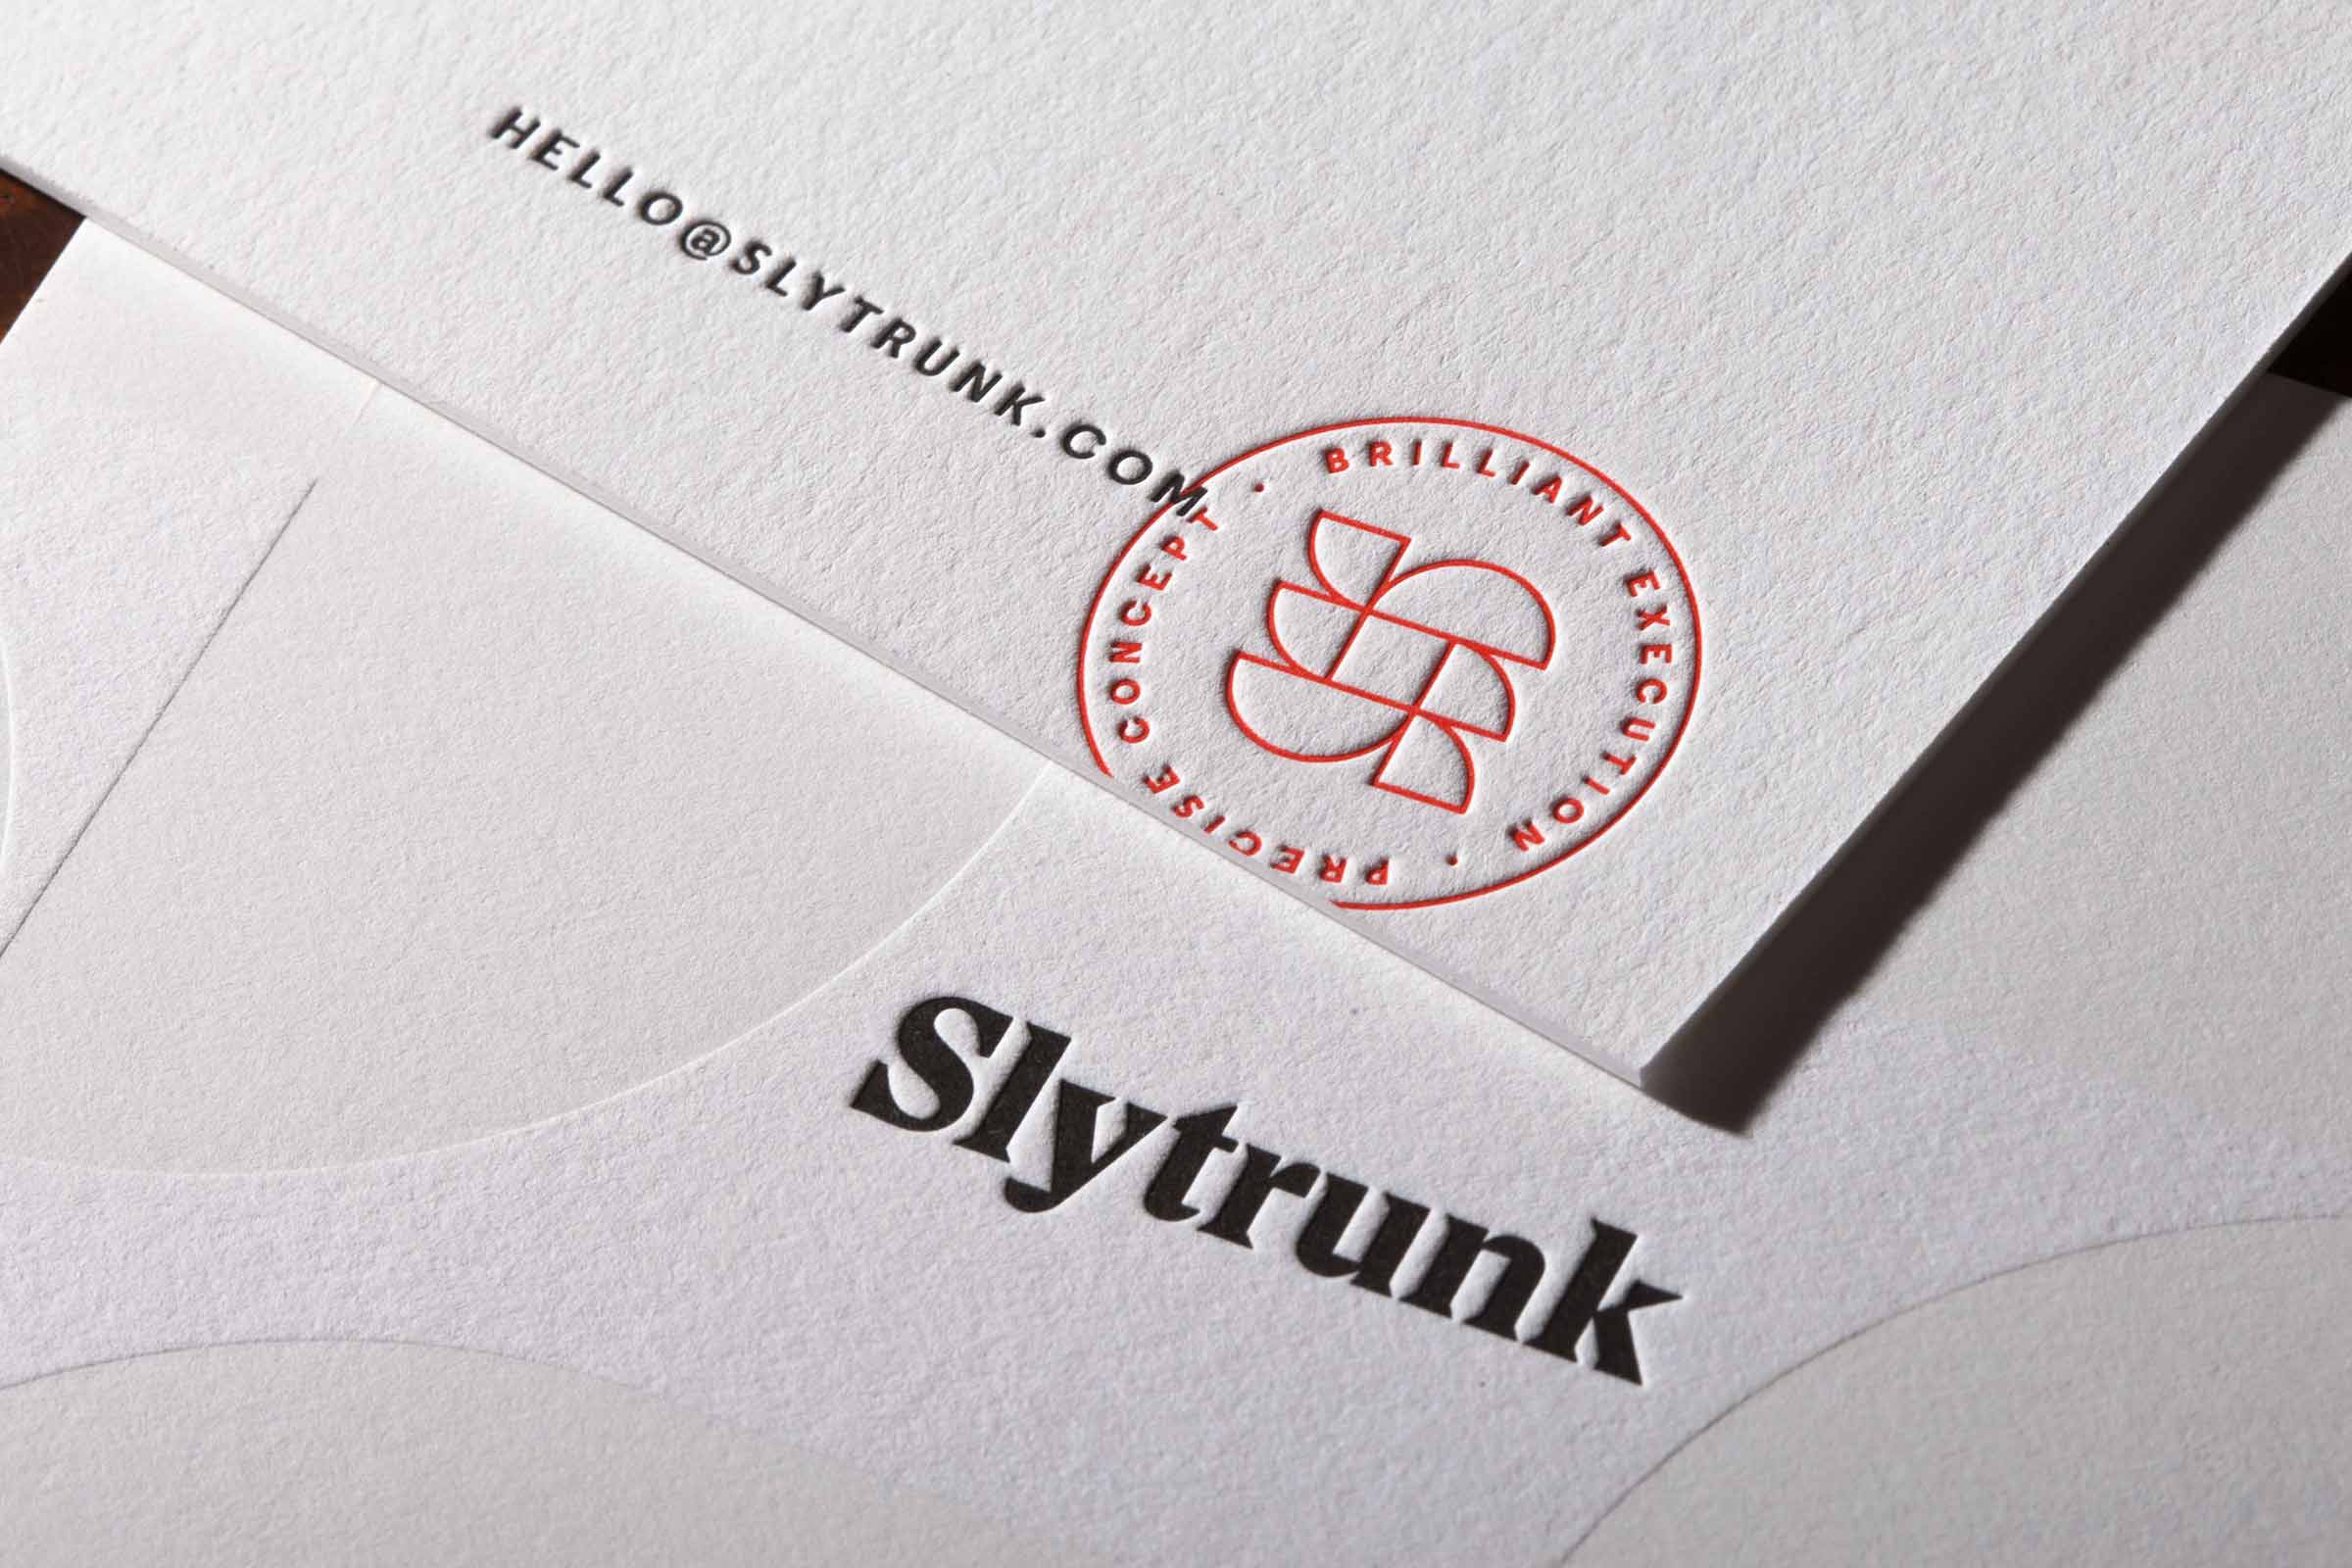 Slytrunk-Main-Image